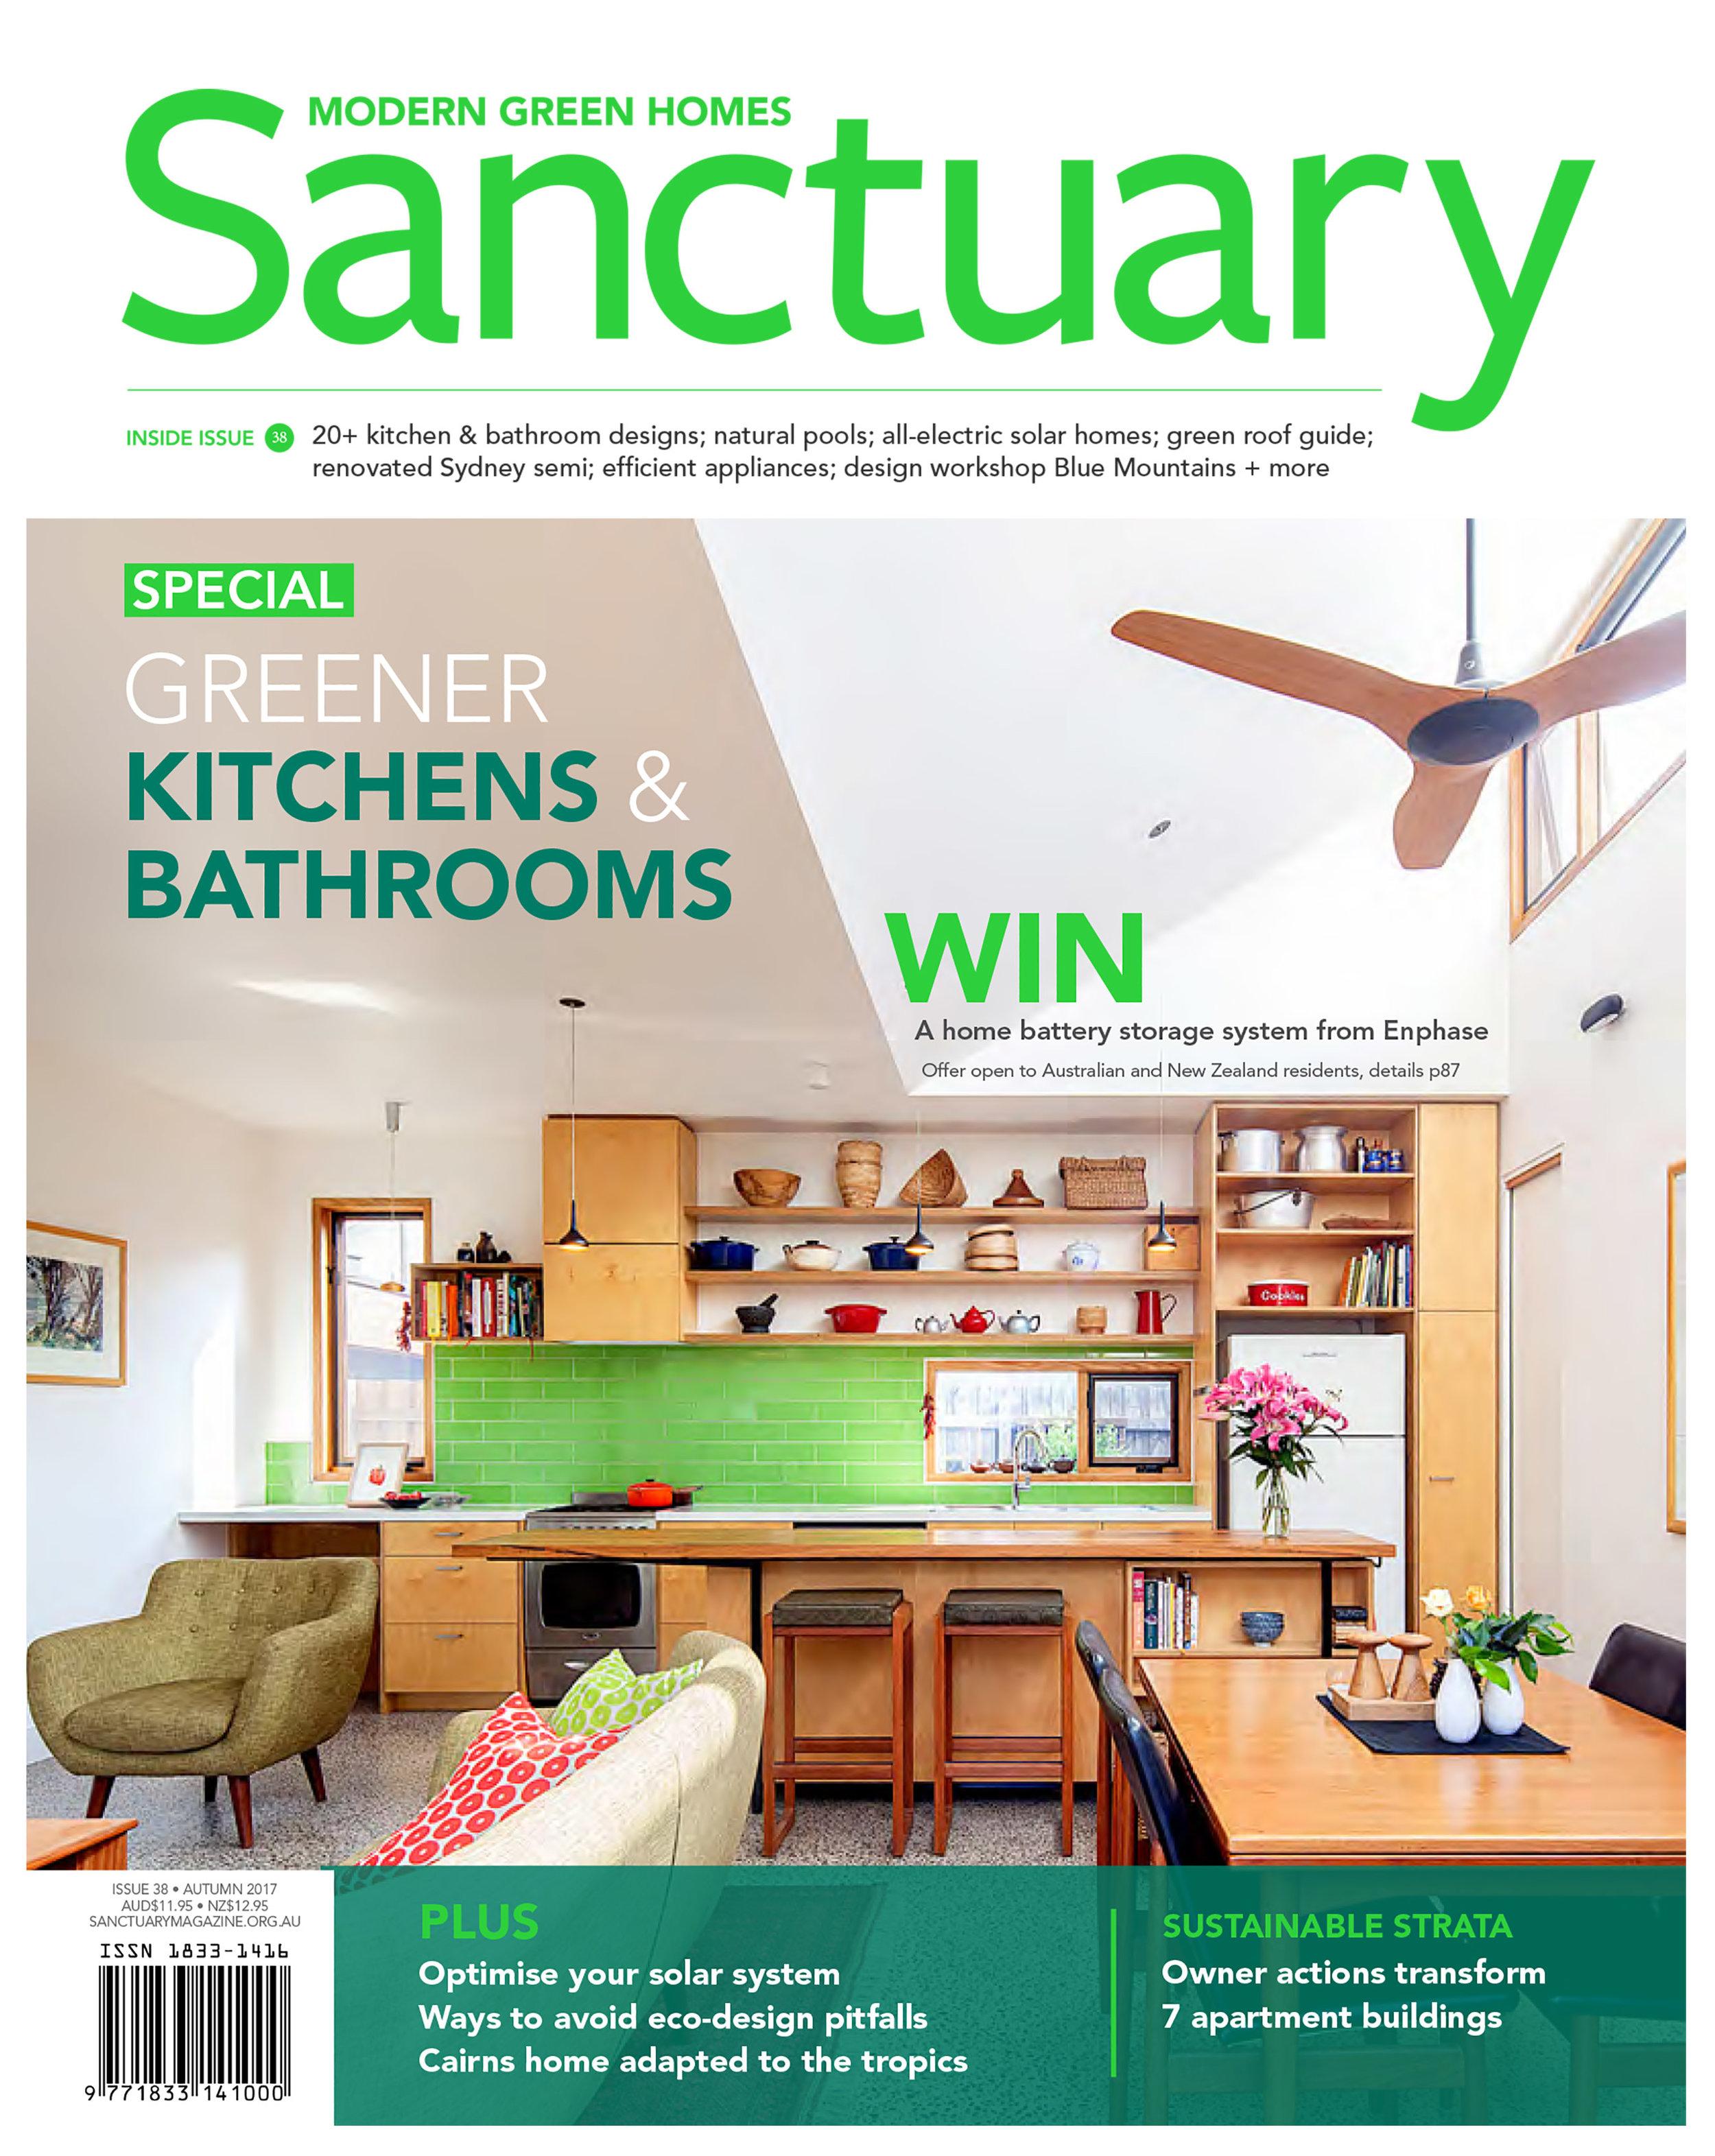 Sanctuary magazine issue 38 larger.jpg